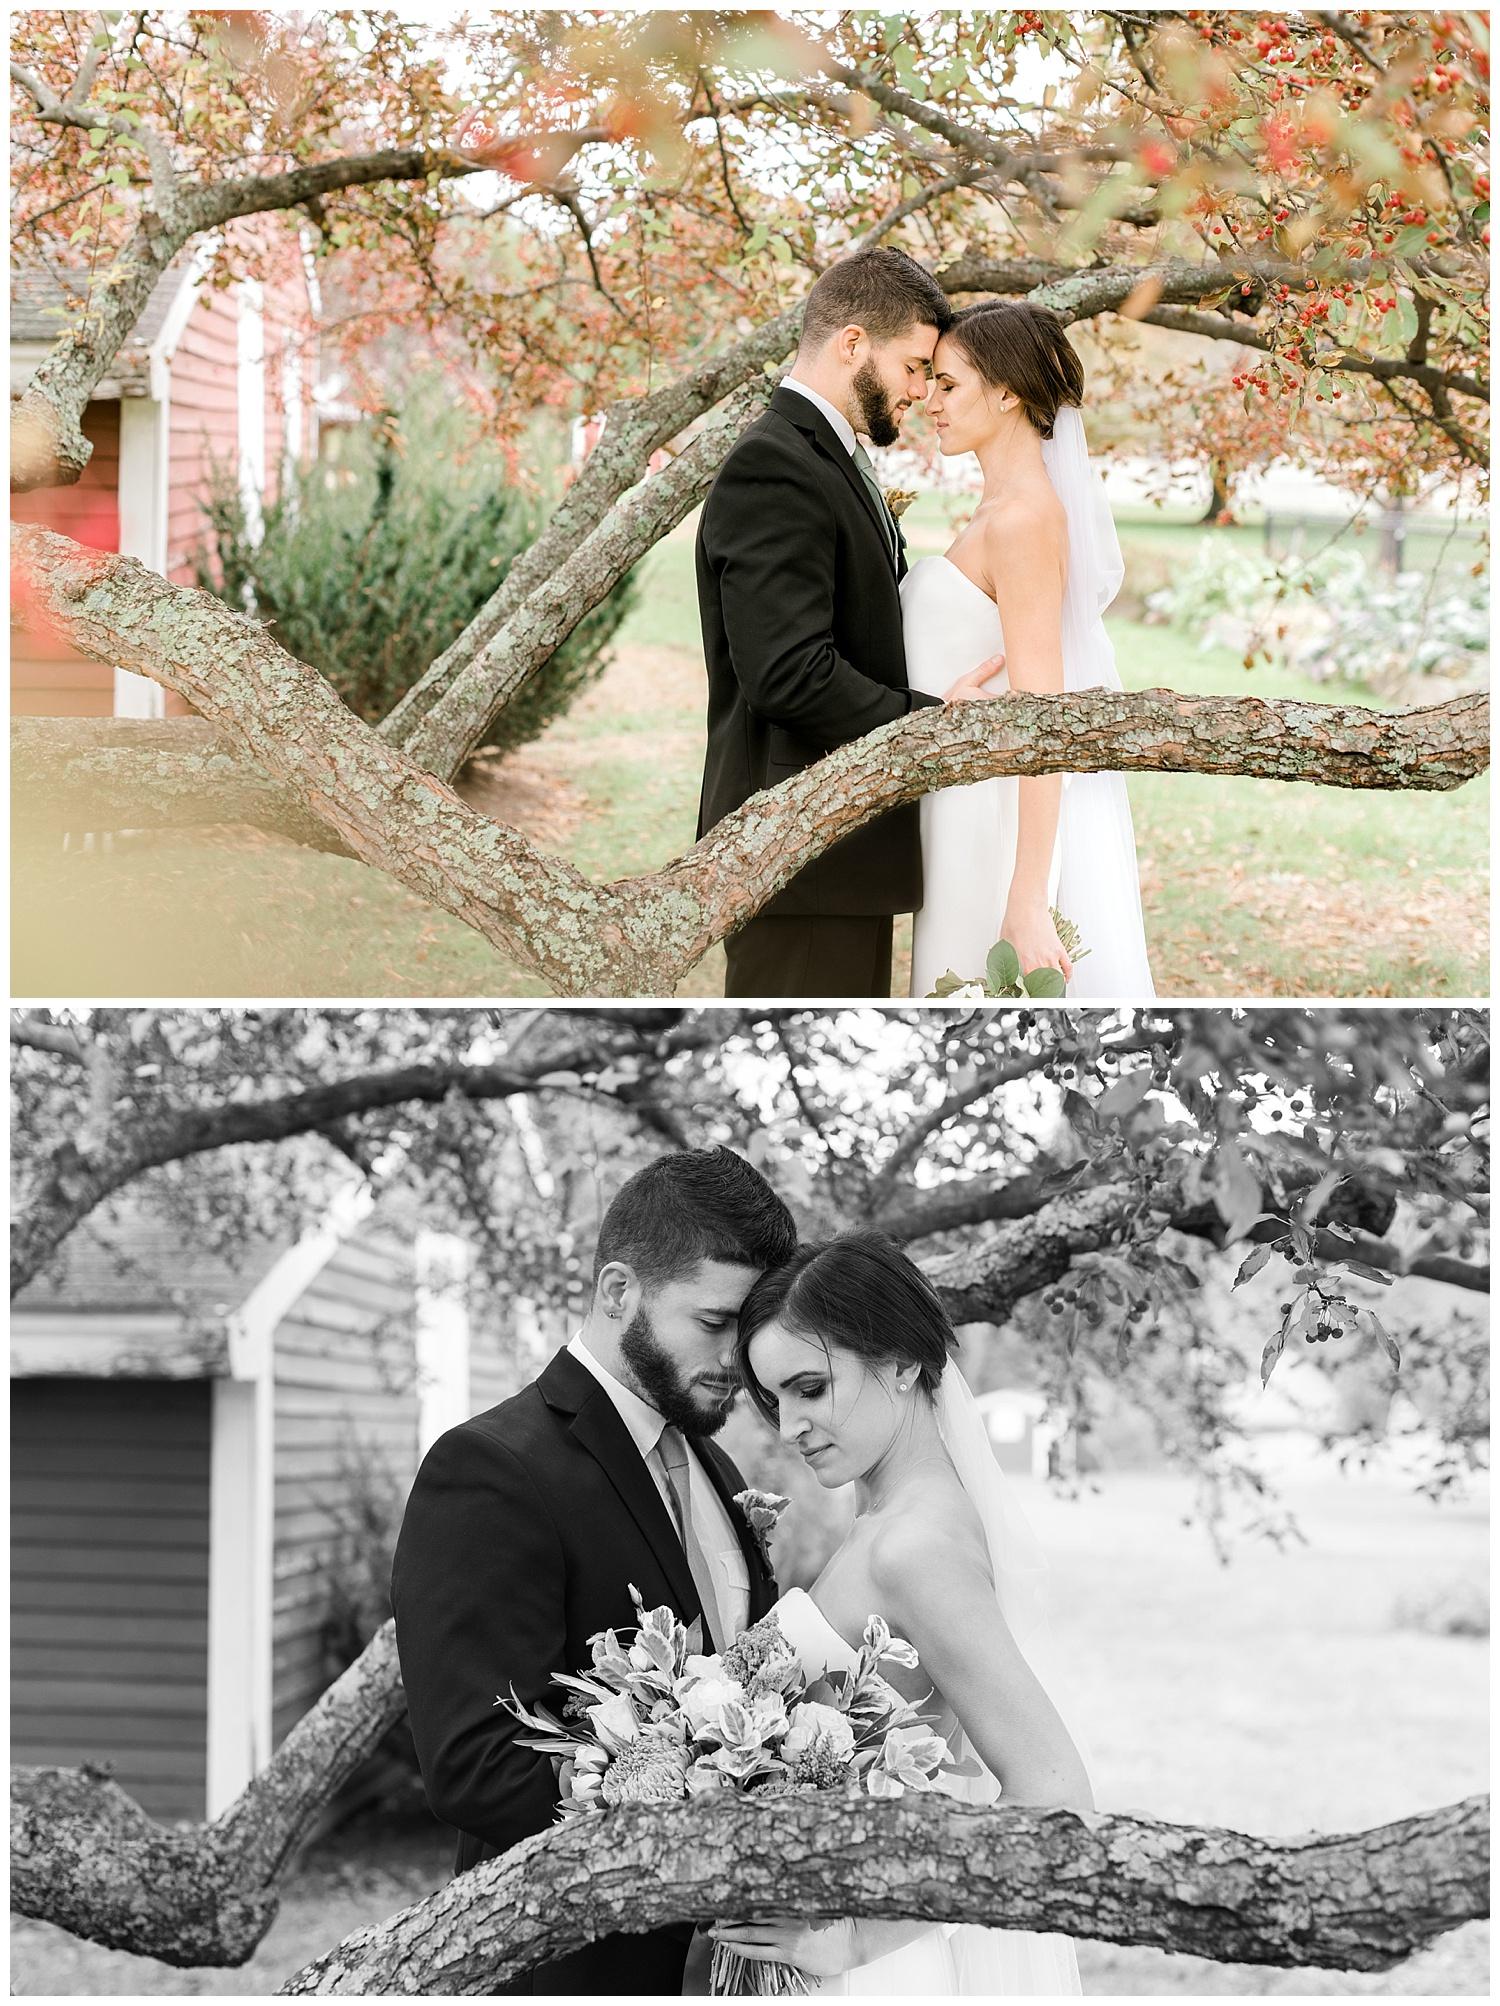 pompositticut-farm-fall-wedding-photography-hudson-massachusetts-photo-10.jpg